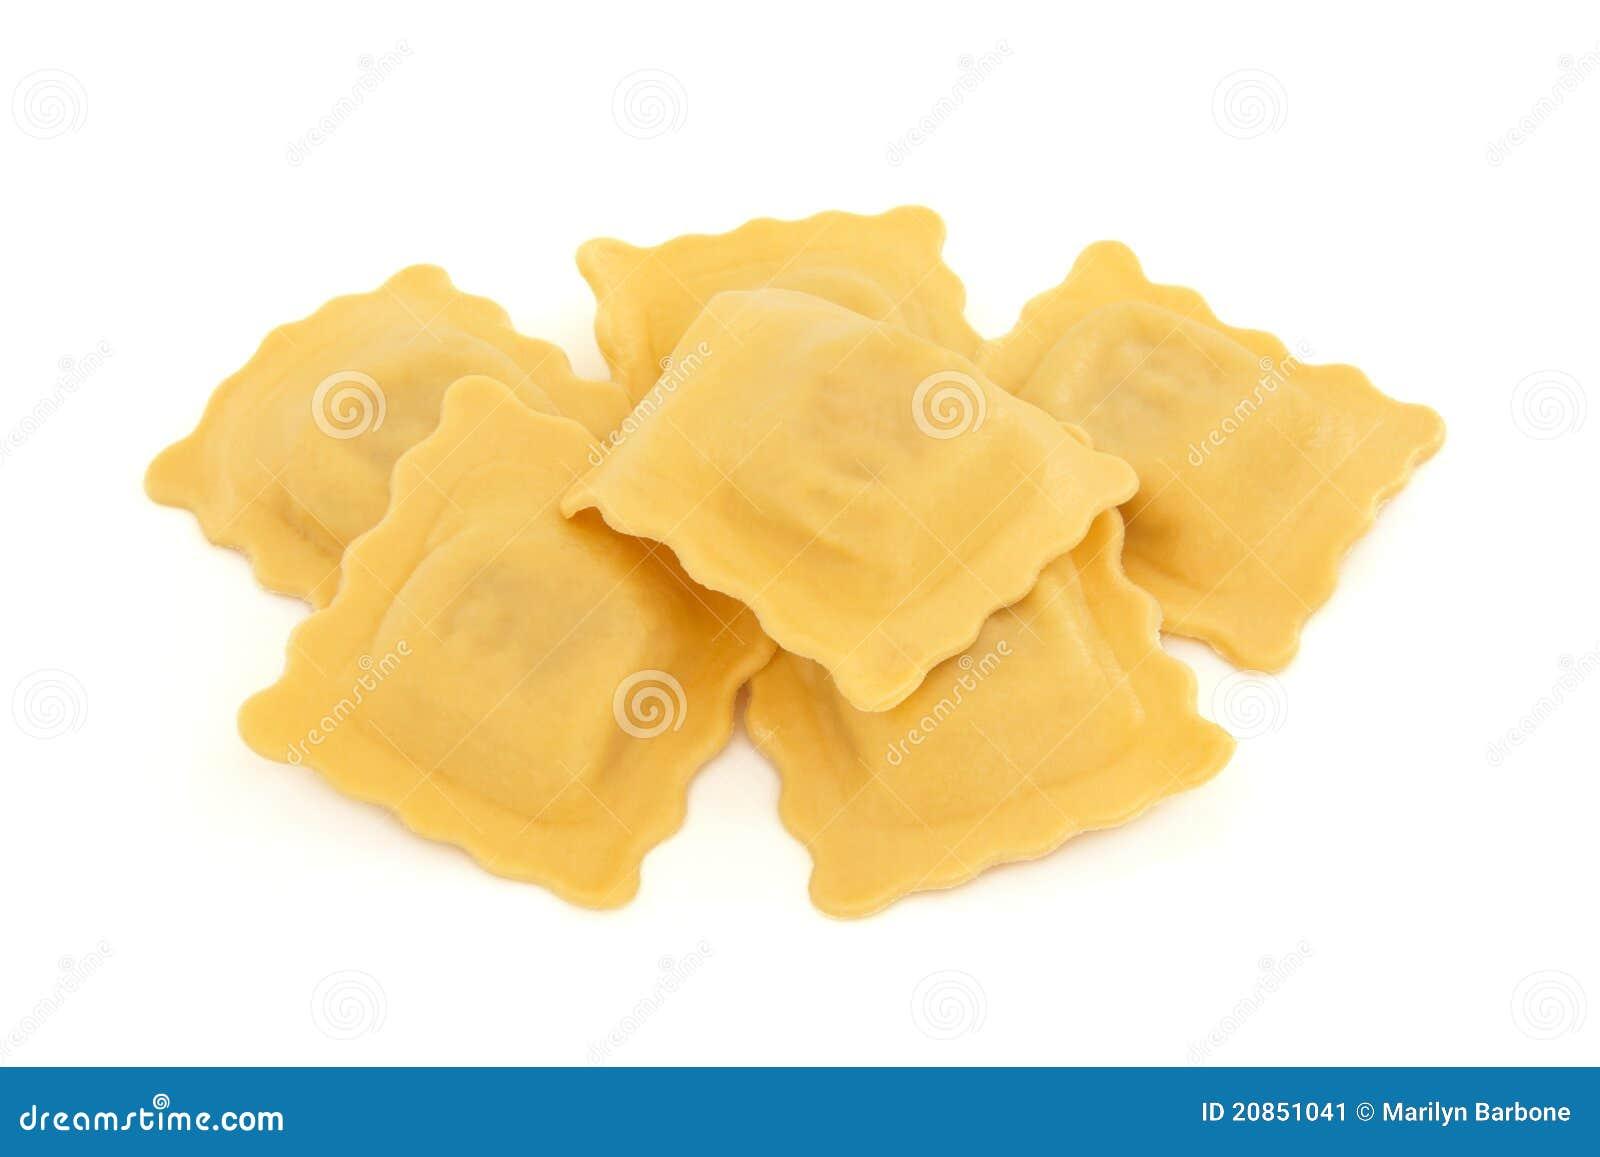 ravioli pasta stock image image of meal background